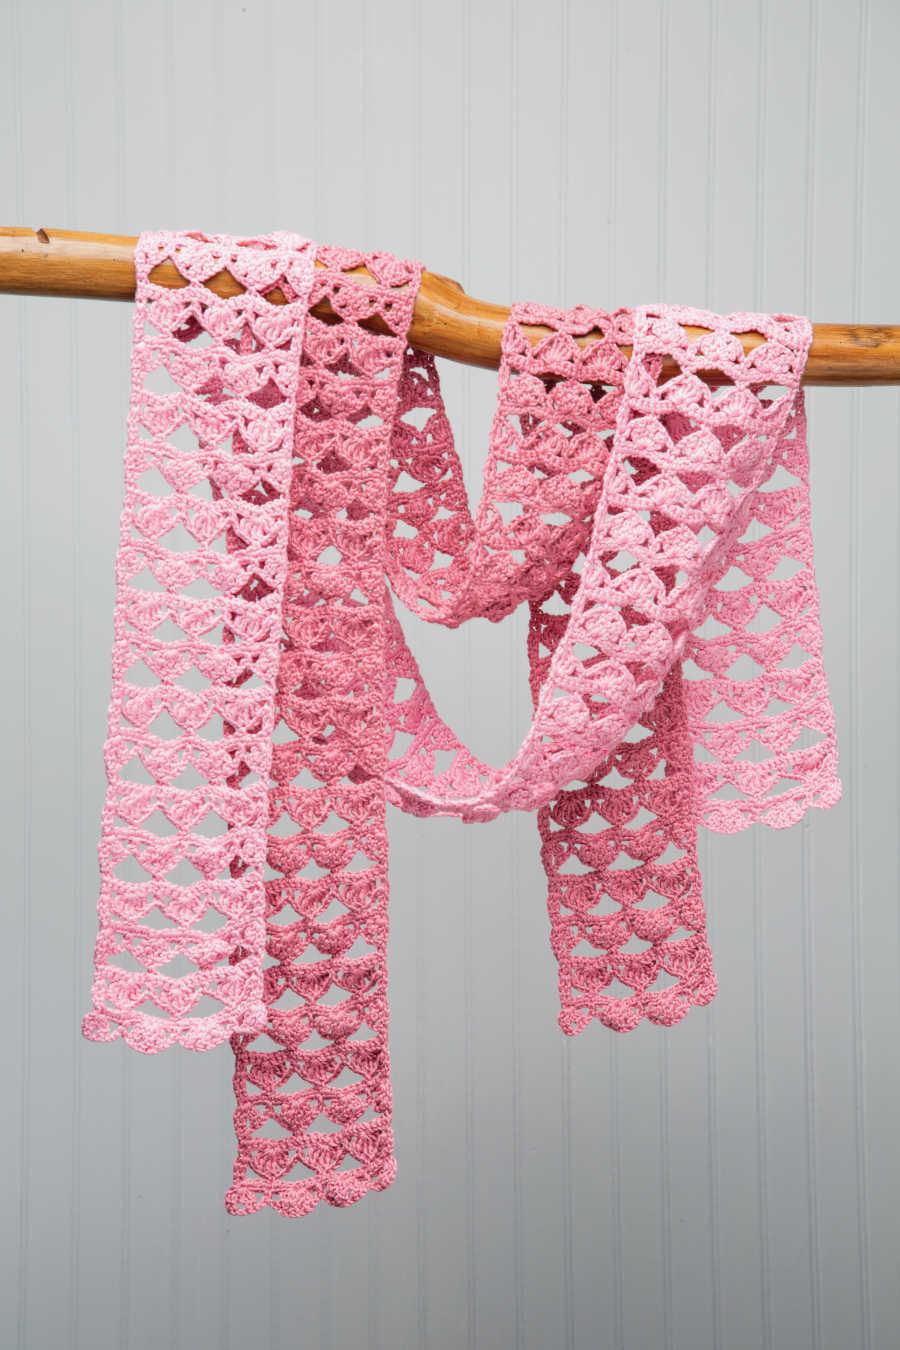 Handmade, pink scarf